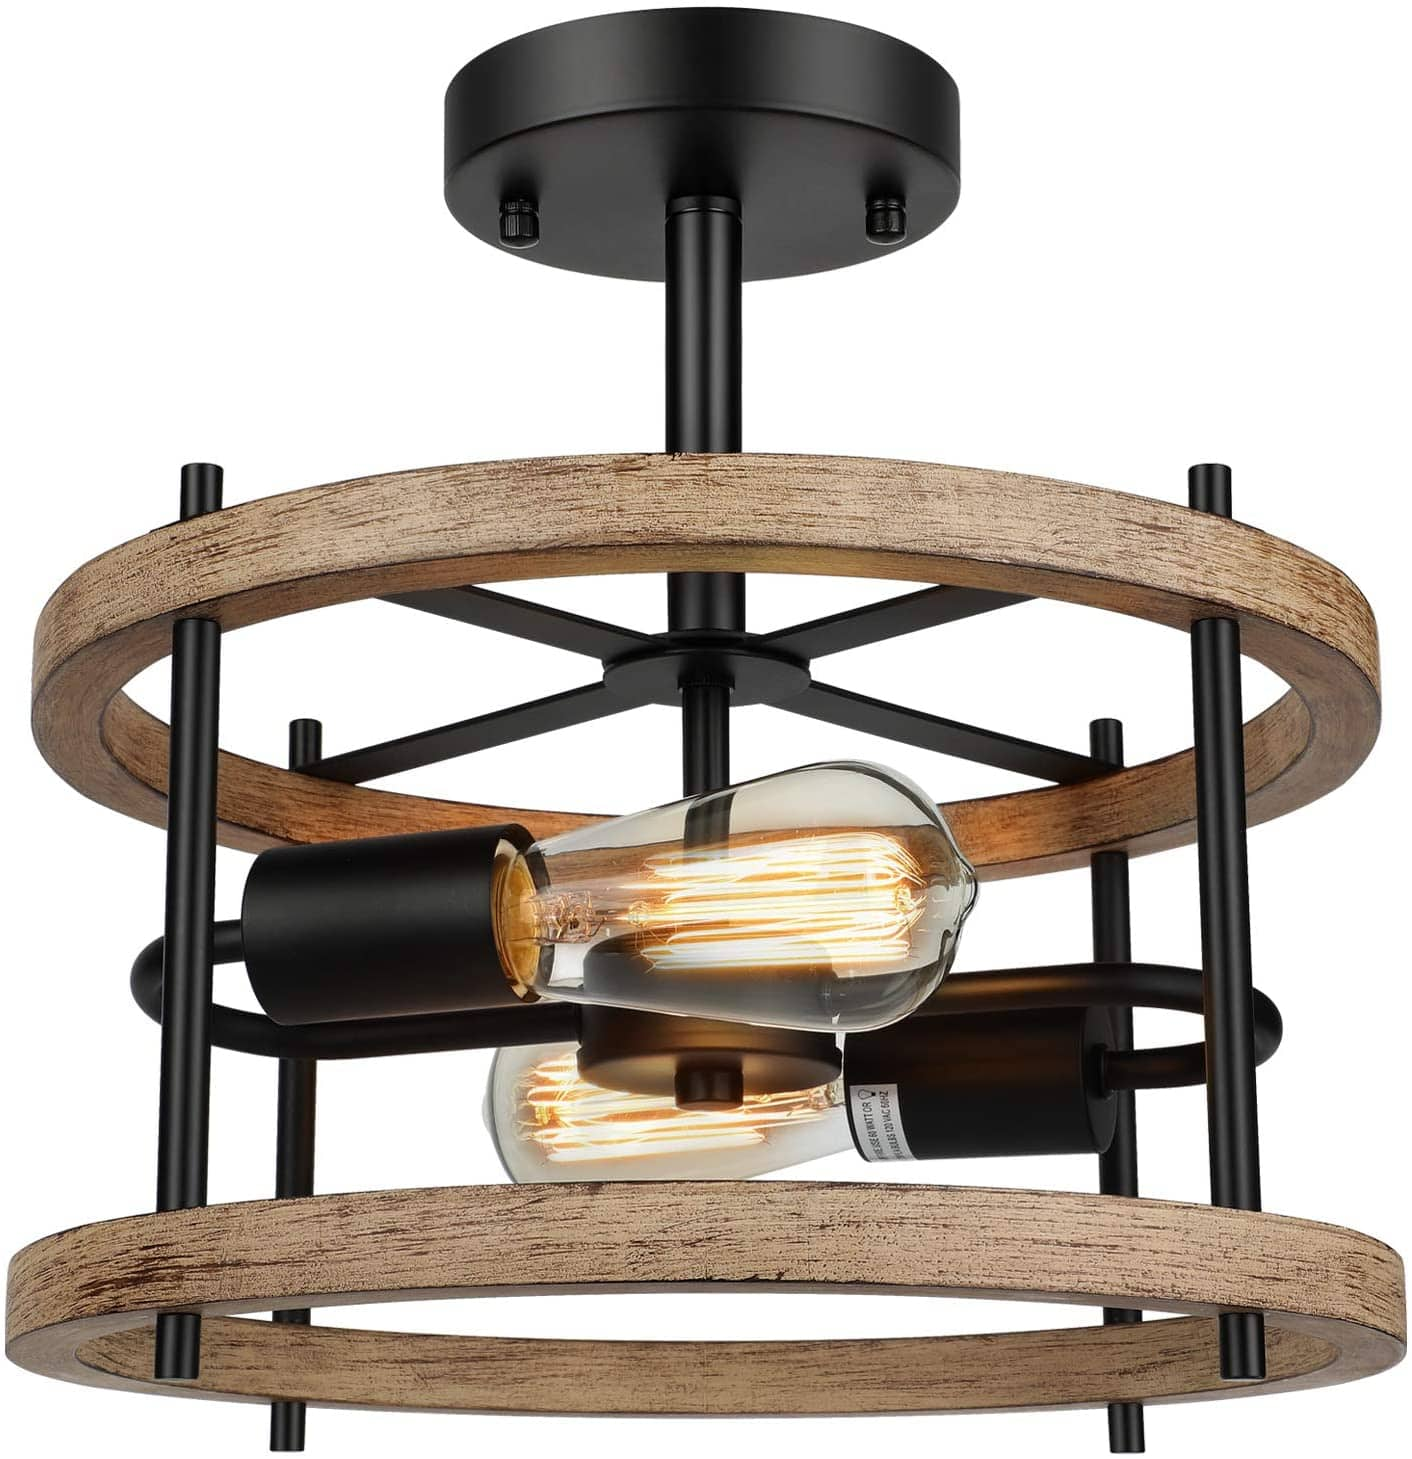 Lakumu 2-Light E26 Retro Semi Flush Wood Mount Ceiling Light $28 + Free Shipping @ Amazon